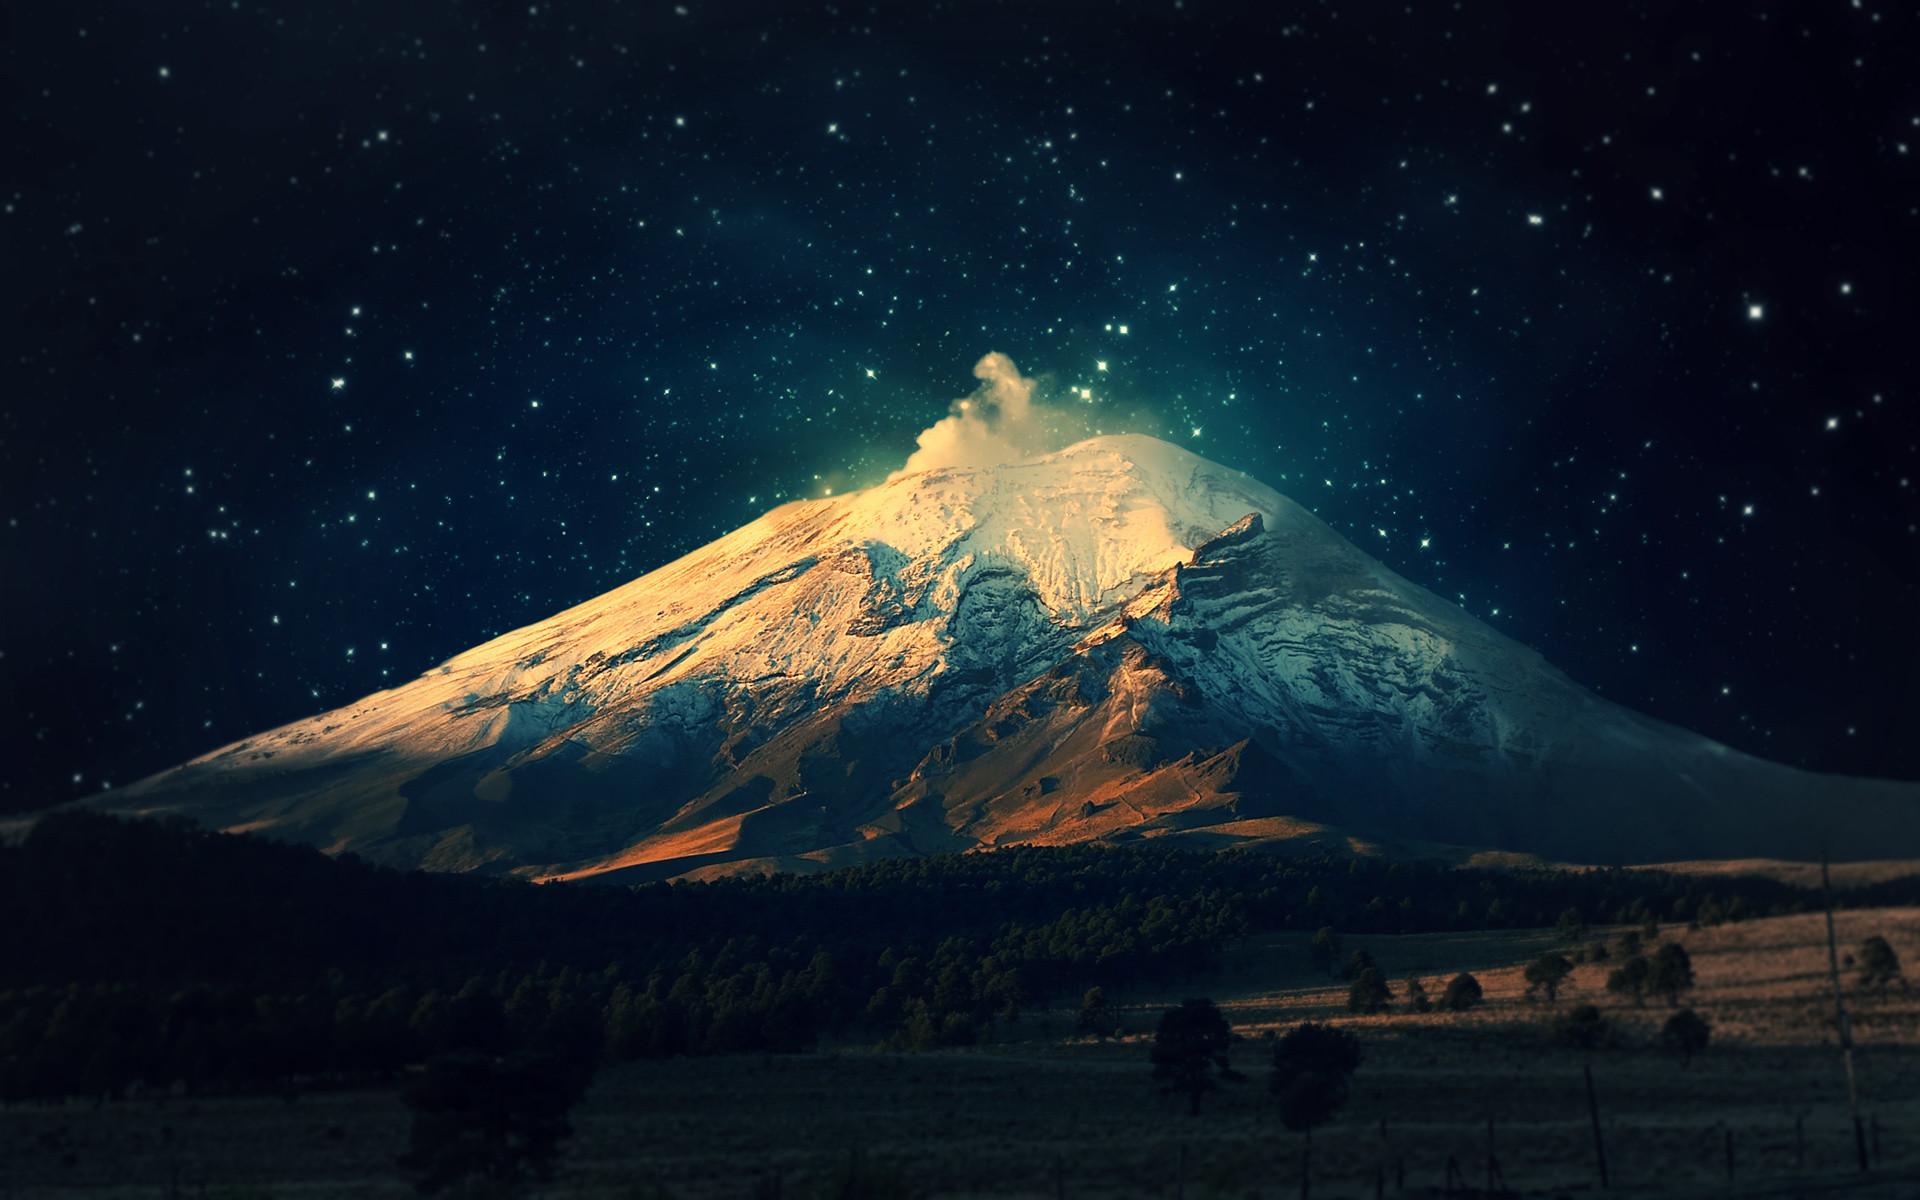 Night Mountain Desktop Wallpapers For Desktop Wallpaper px 589.28  KB